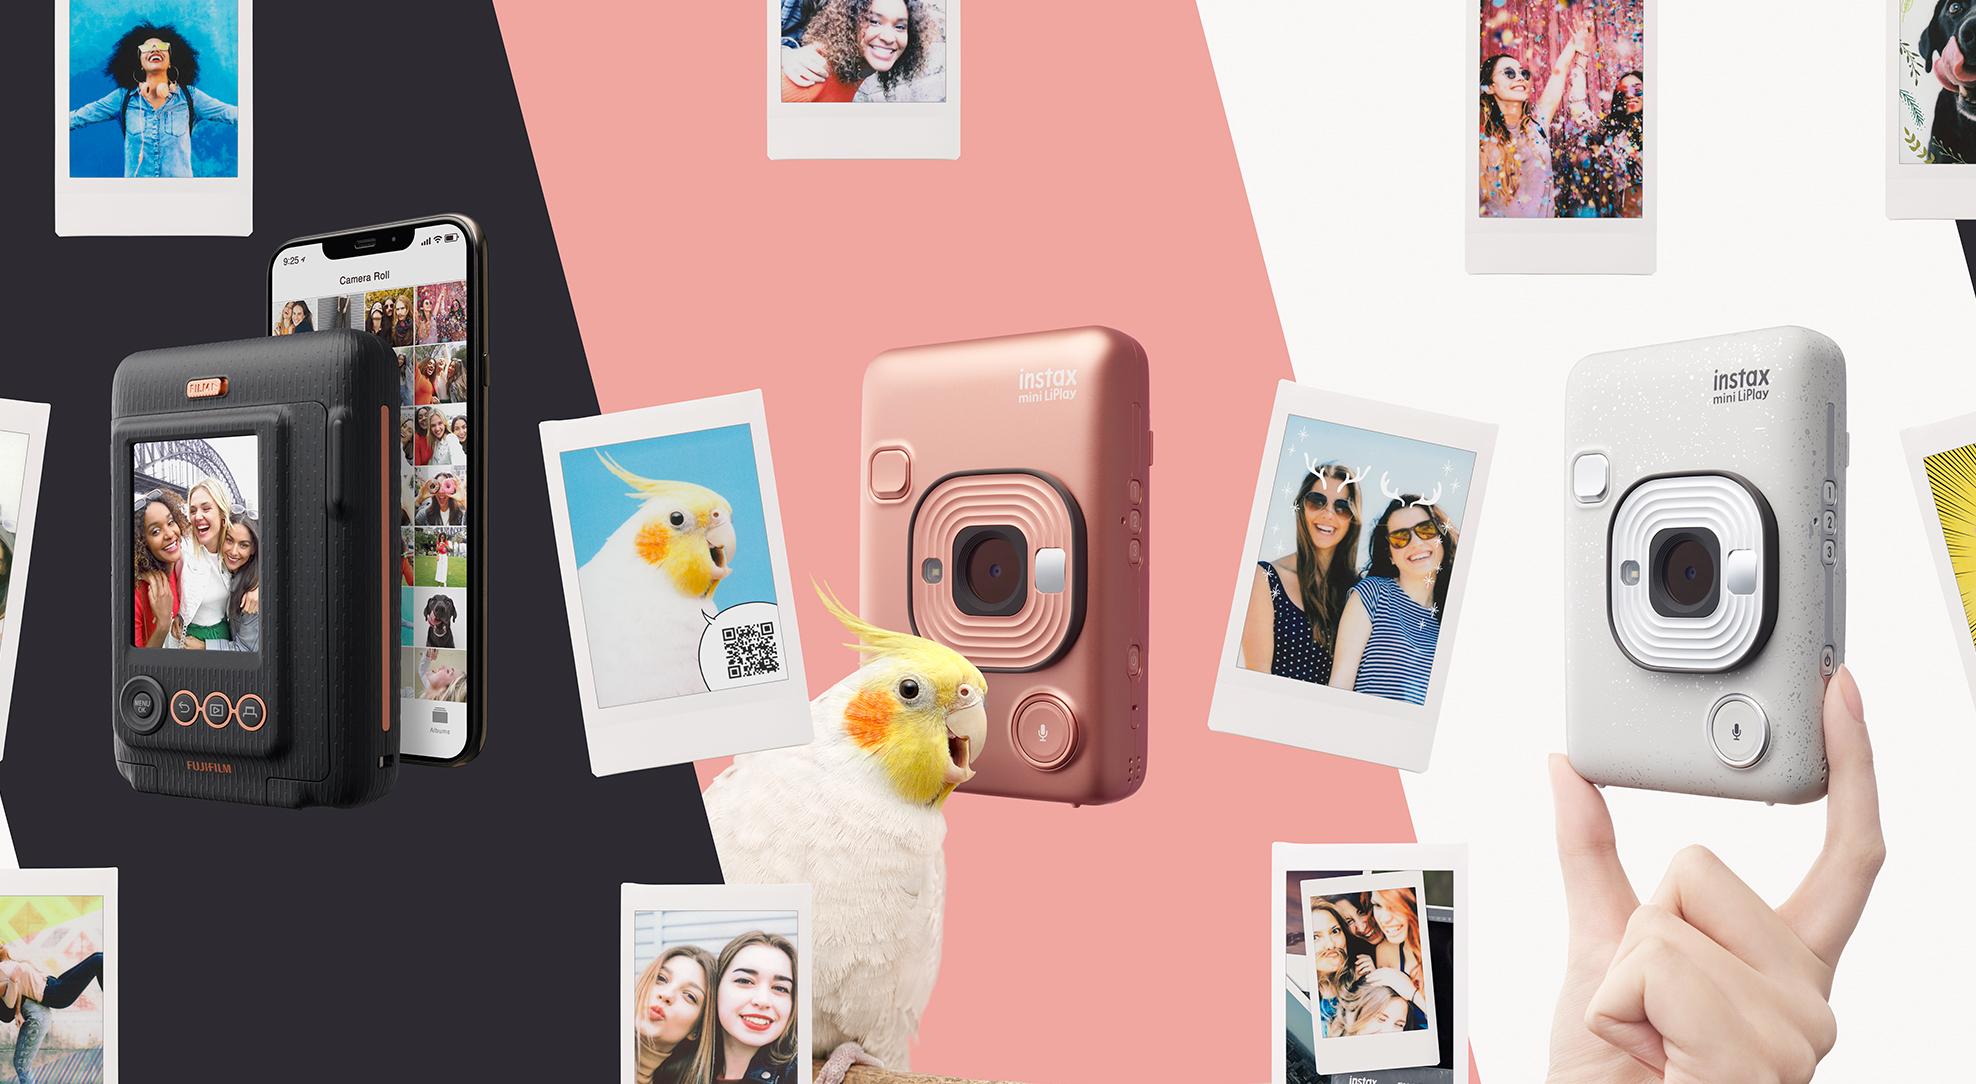 Instax mini LiPlay: миниатюрная революция моментальной печати